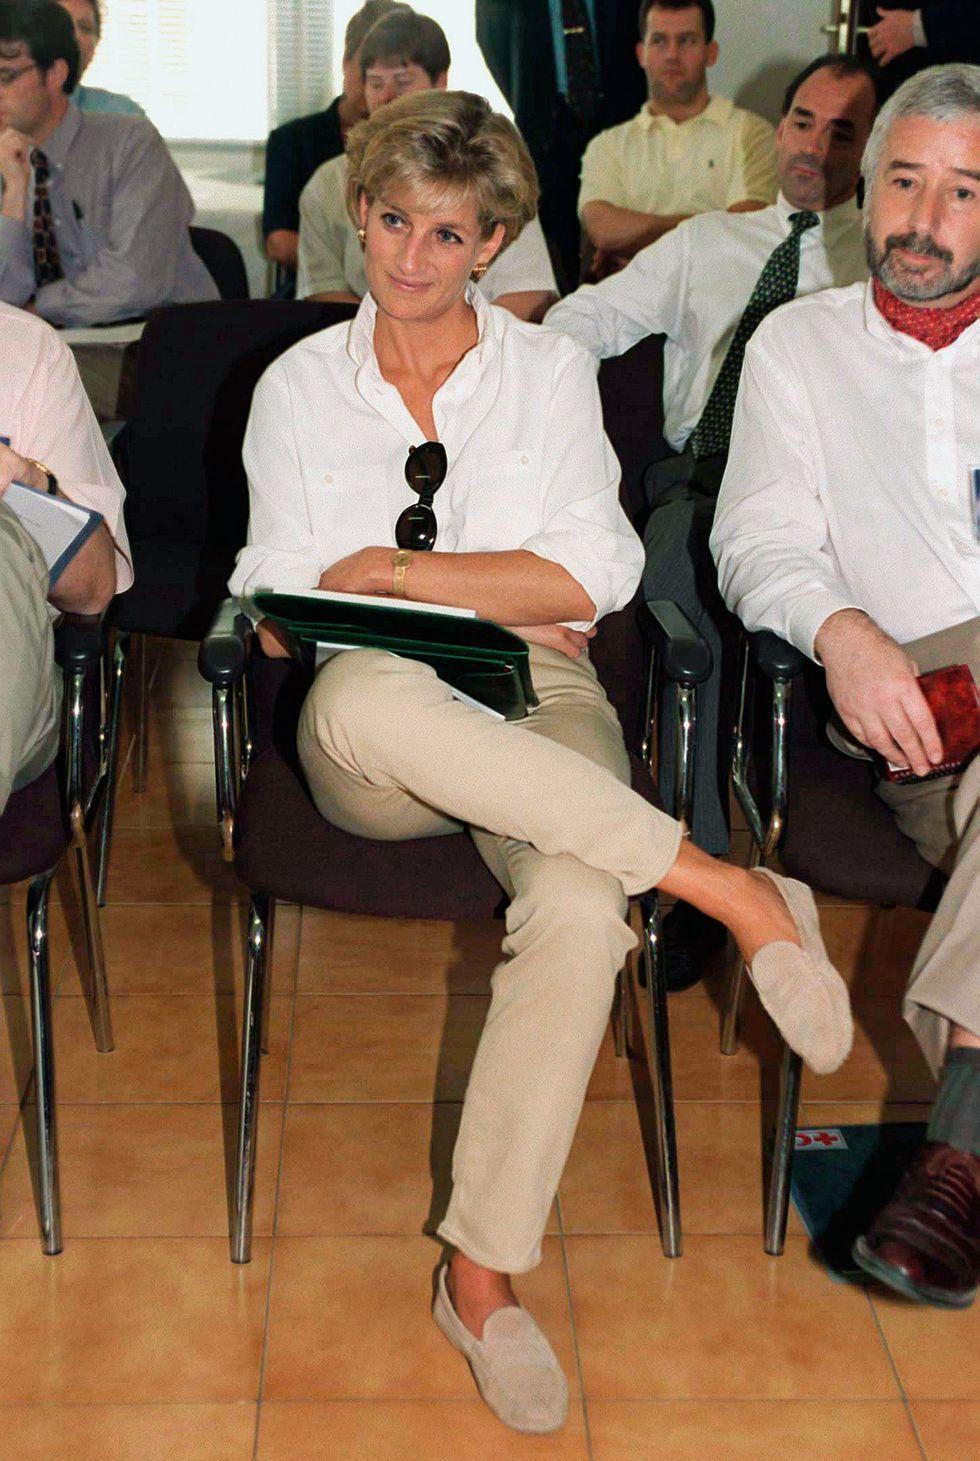 11 Moving Photos of Princess Diana's 1997 Trip to Angola